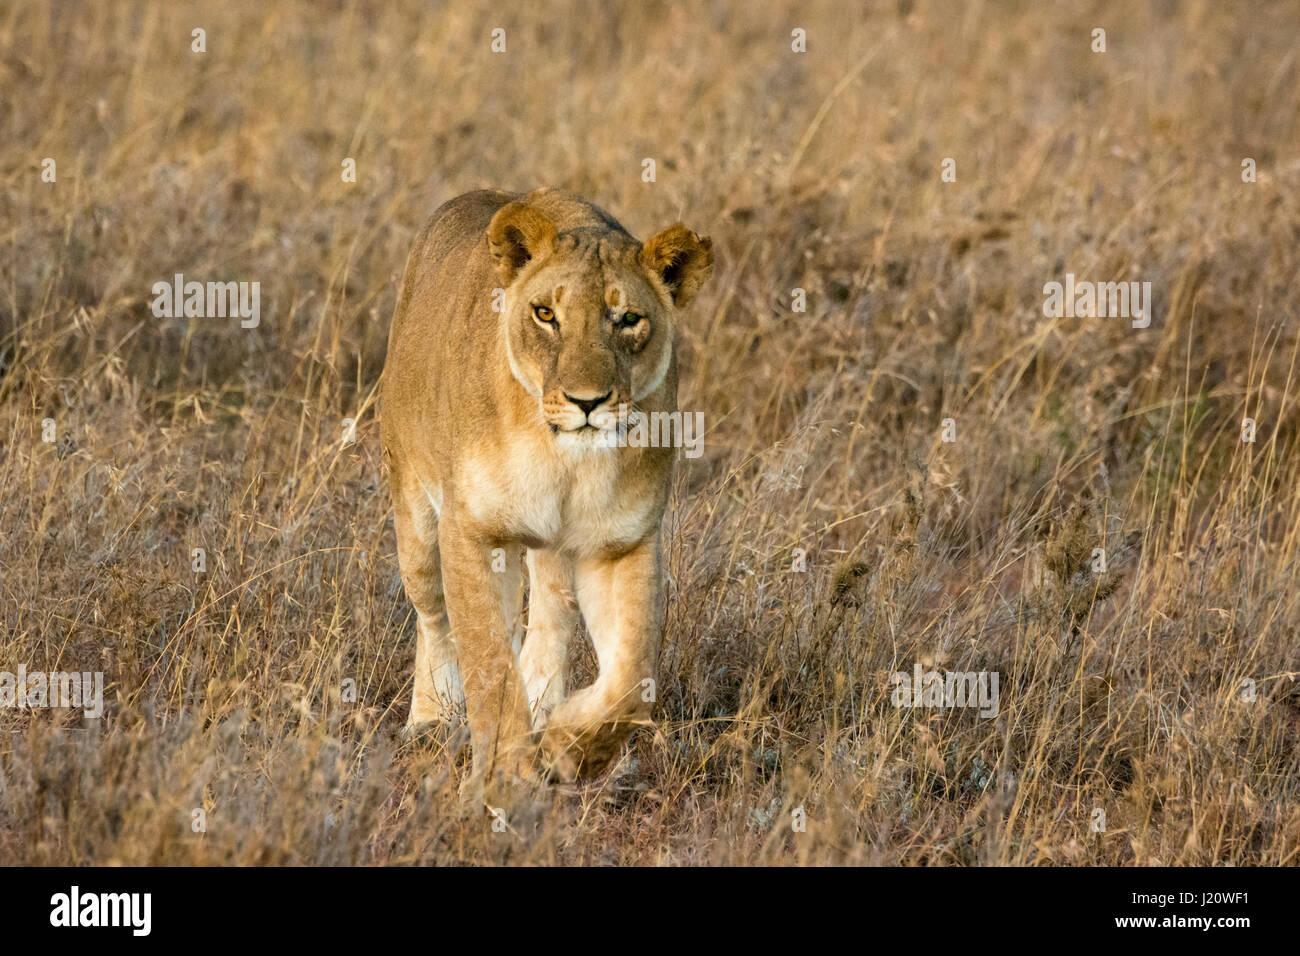 one-eyed-wild-lioness-panthera-leo-walki